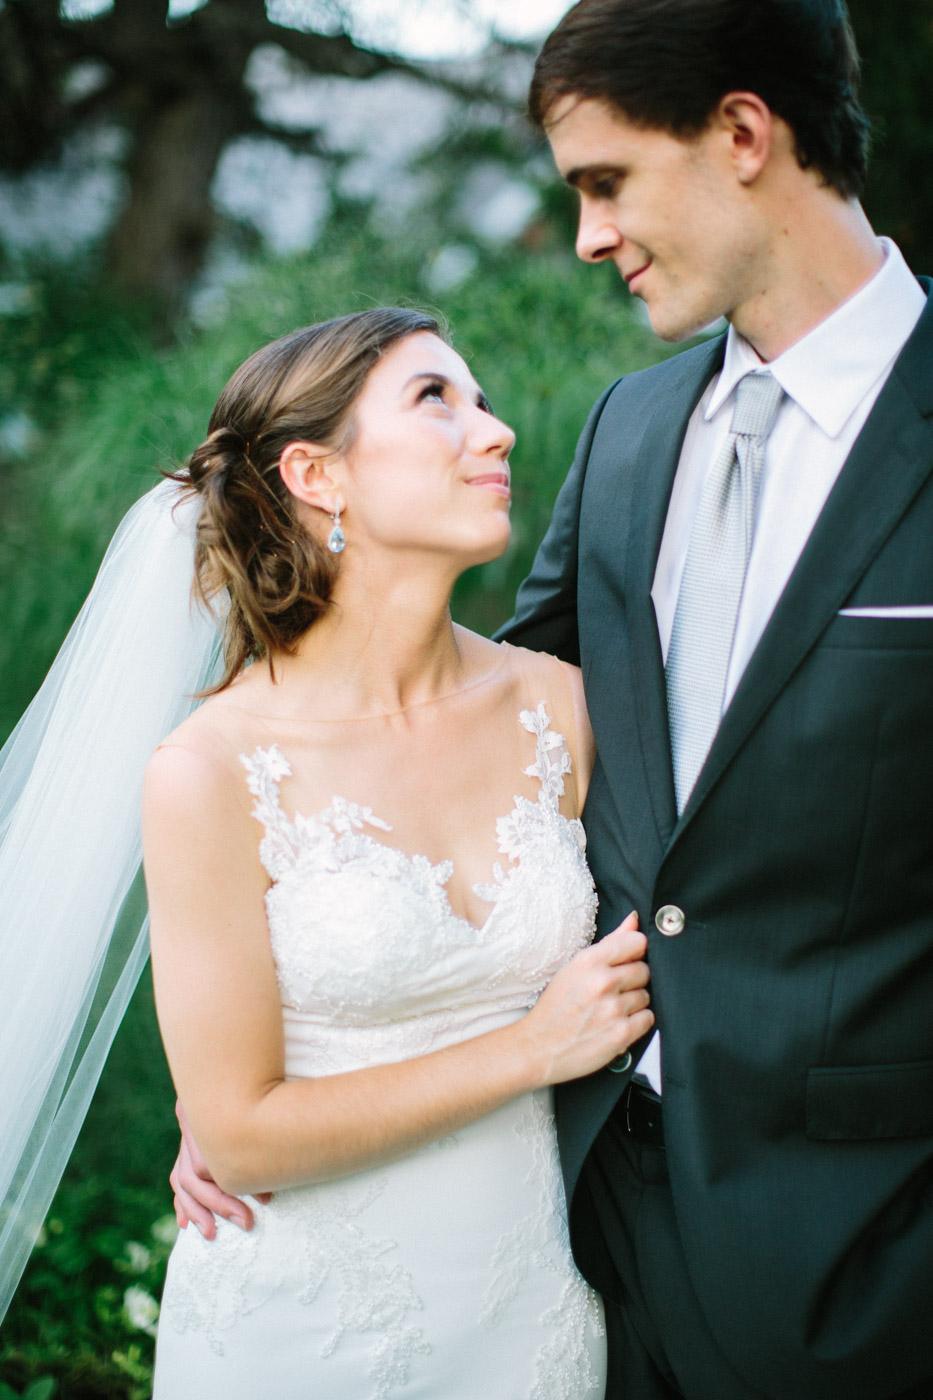 Kelly & Ben Wedding Web 2016-430.jpg